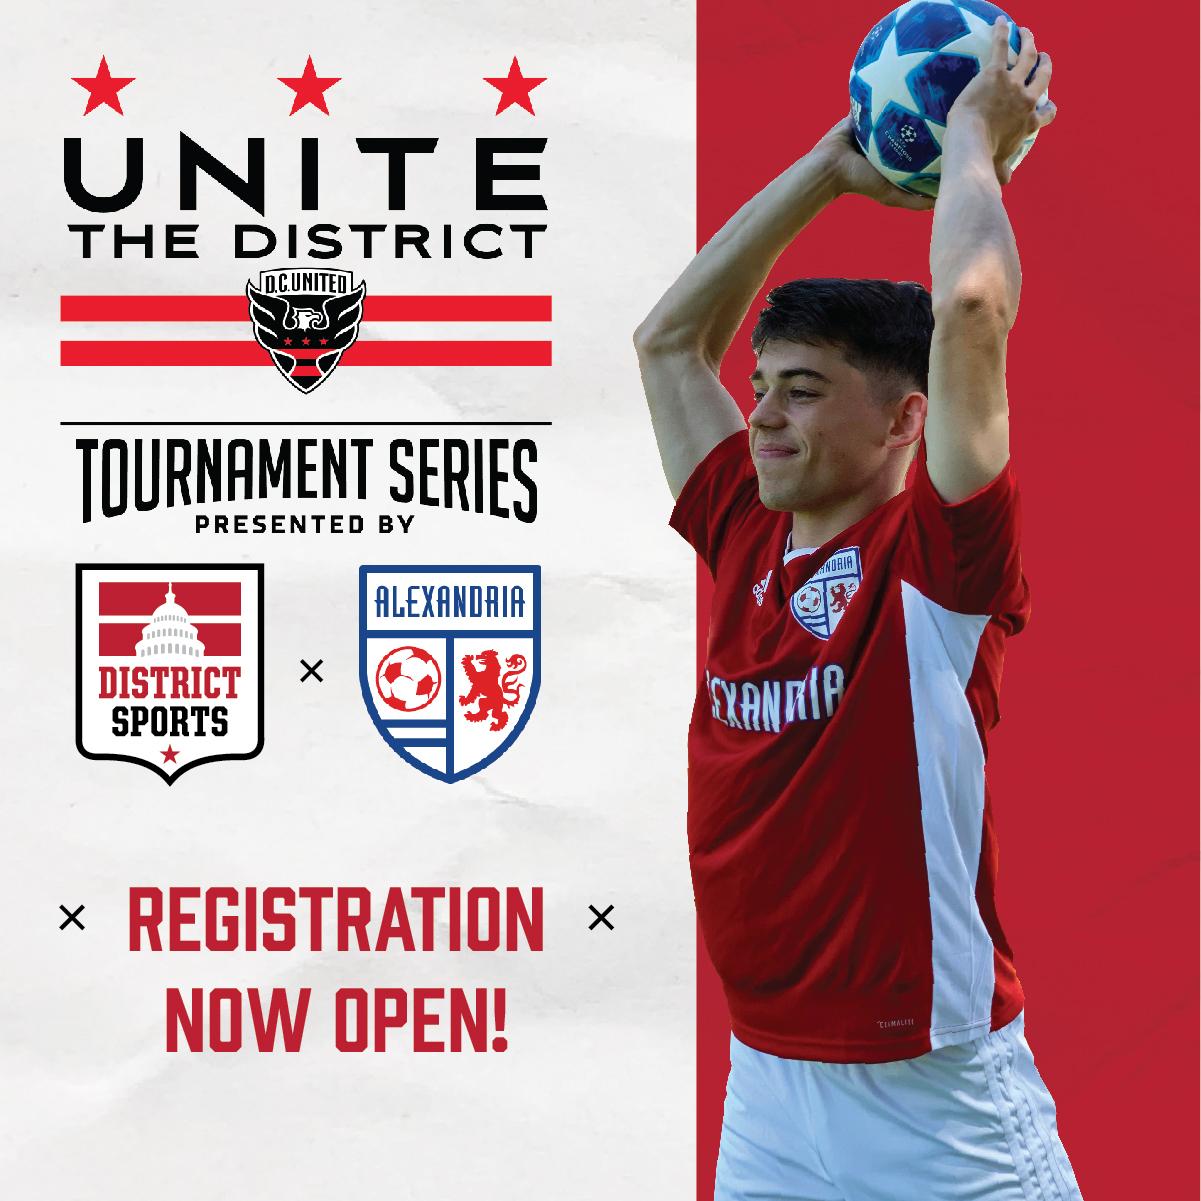 Unite the District 2019 Promos_v2-08.jpg